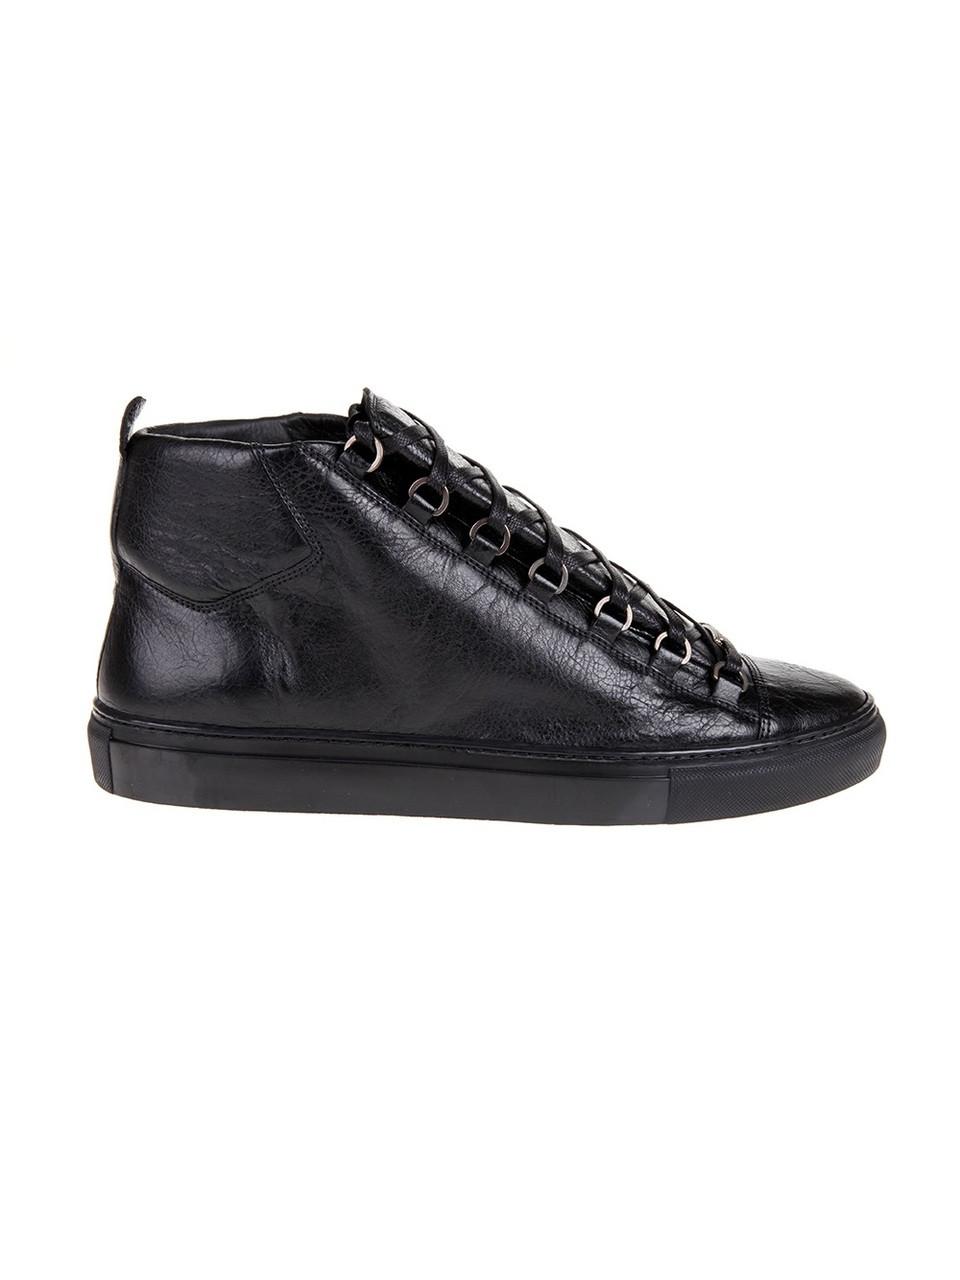 Sole Arena Balenciaga Sneaker The Extra Noir High Closet jLcq345AR